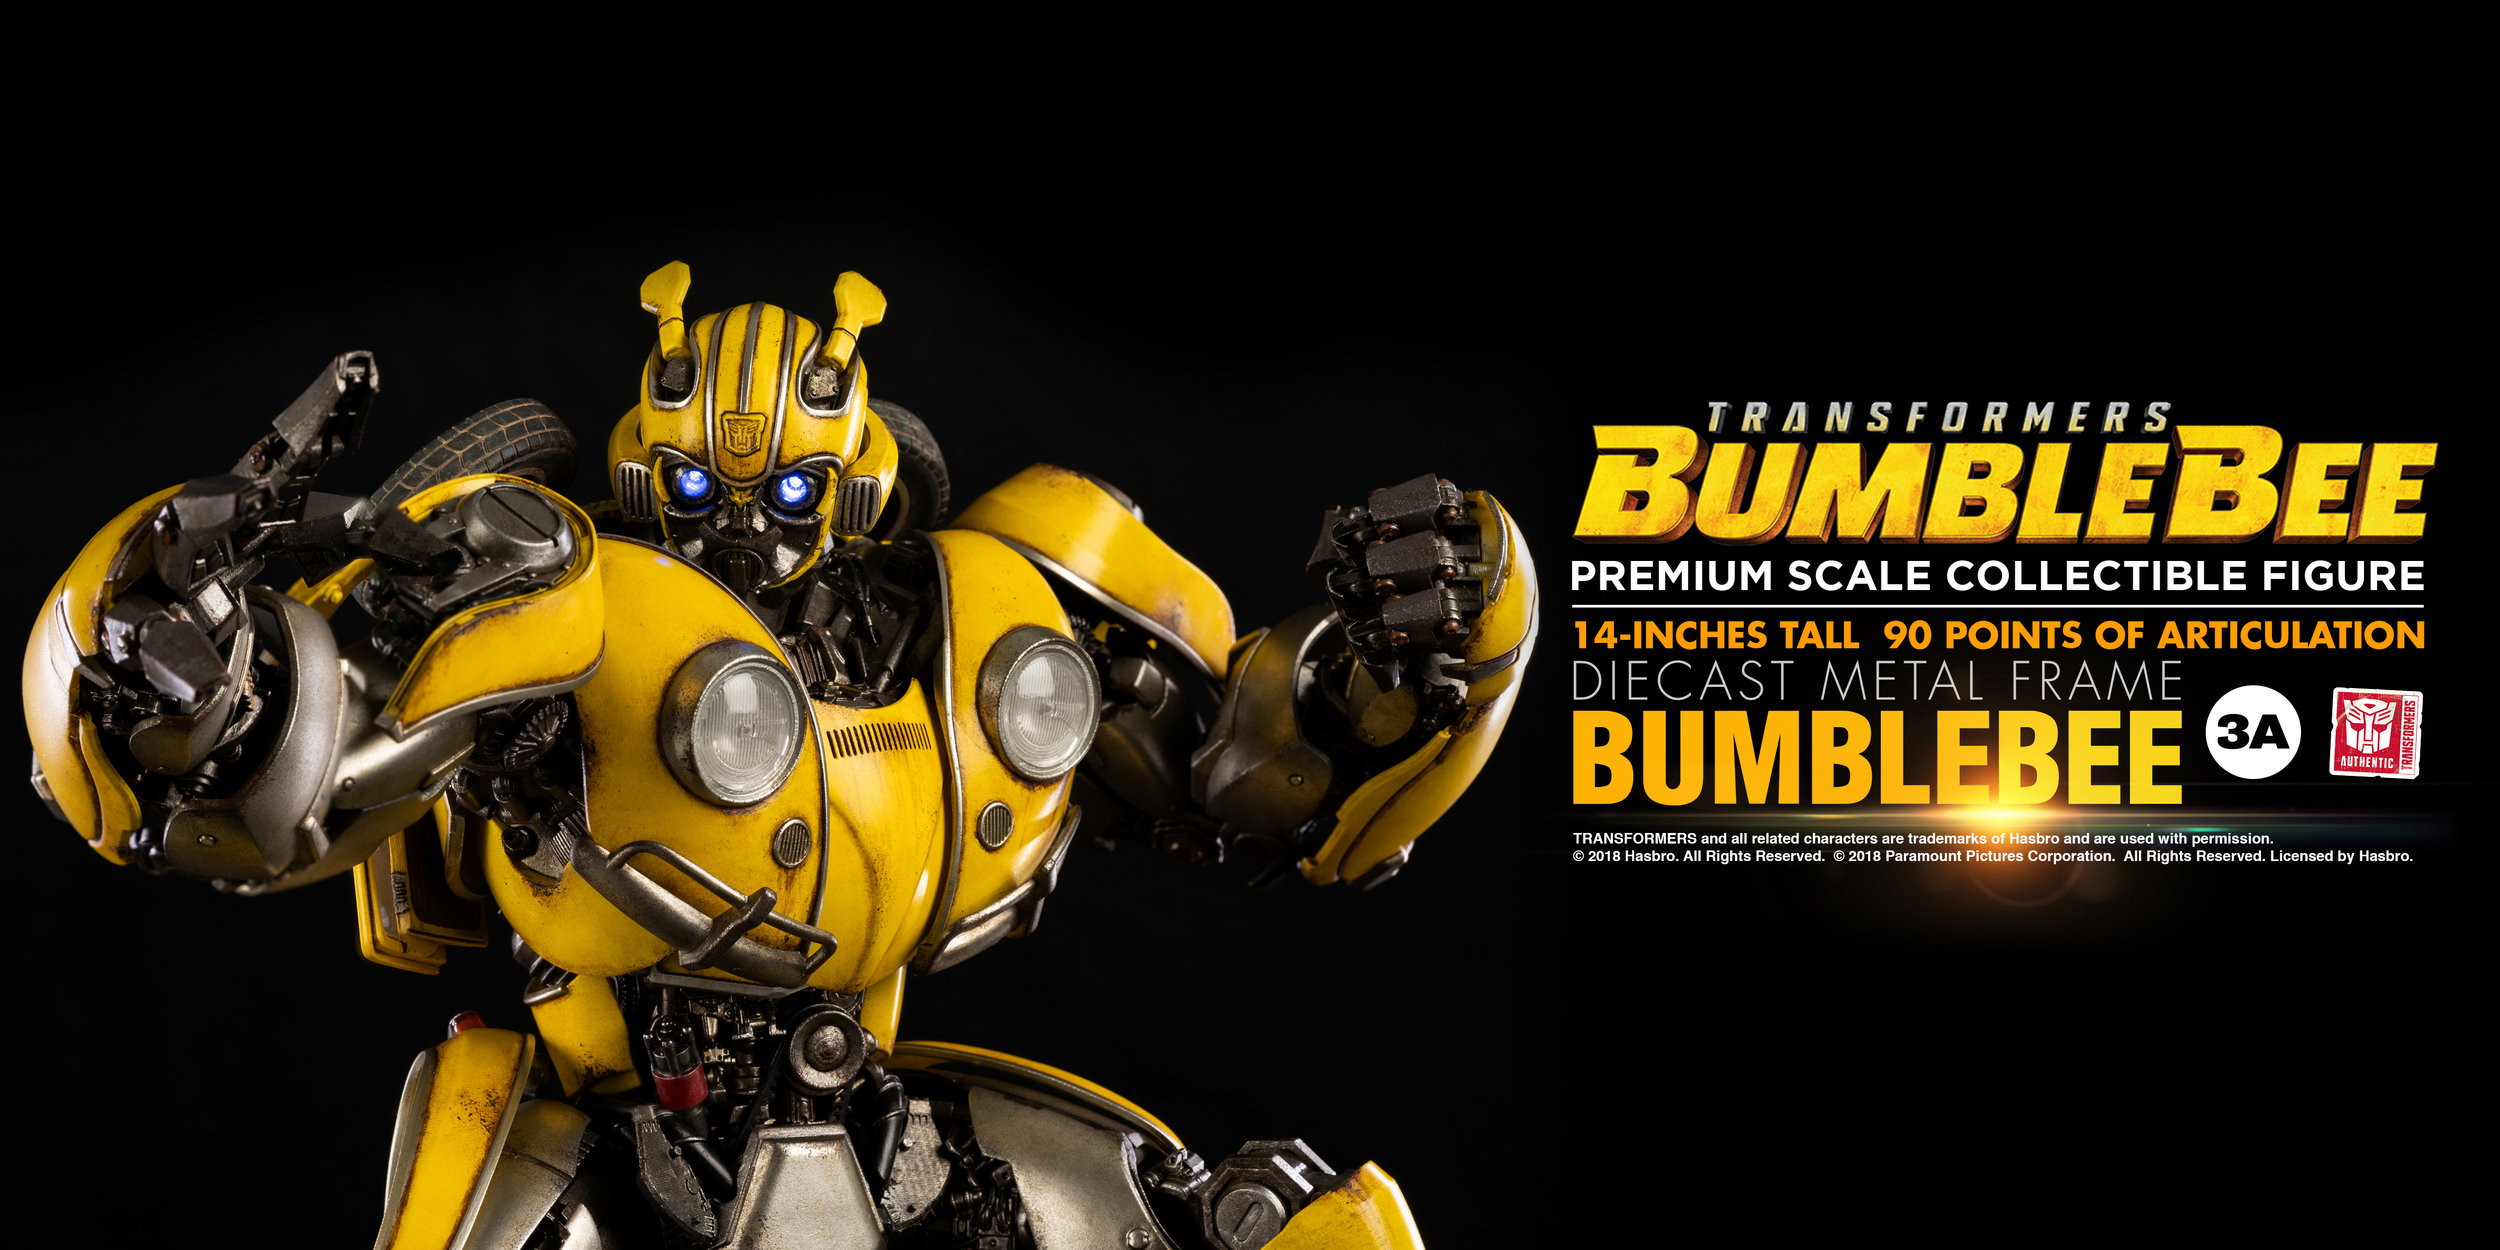 Bumblebee_ENG_PM_WIDE_005.jpg